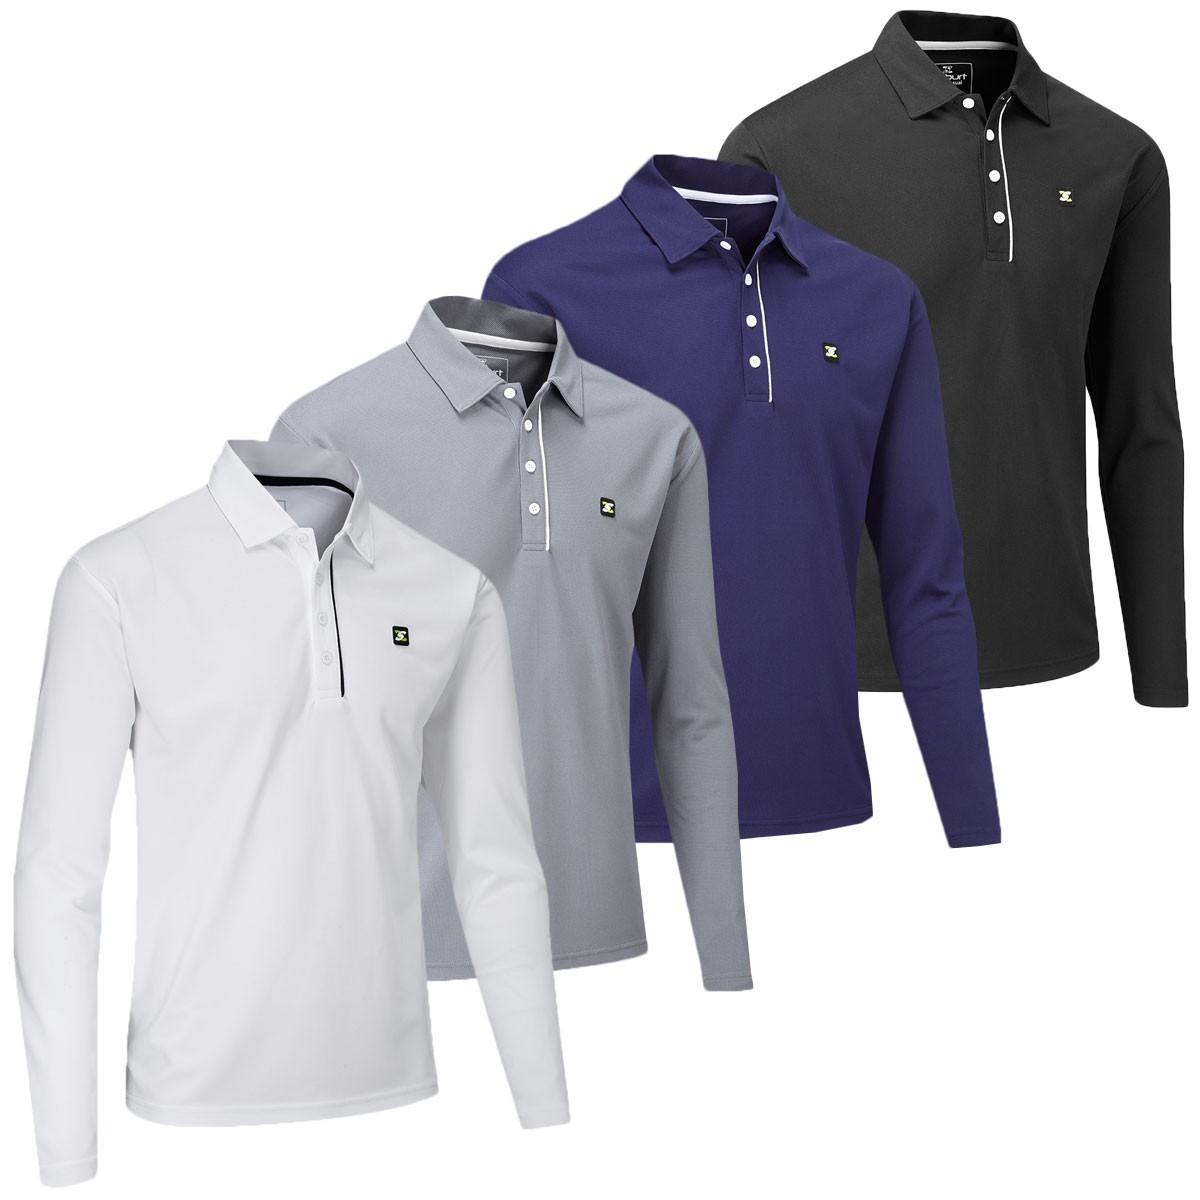 Stuburt 2018 Mens Urban Long Sleeve Golf Polo Shirt